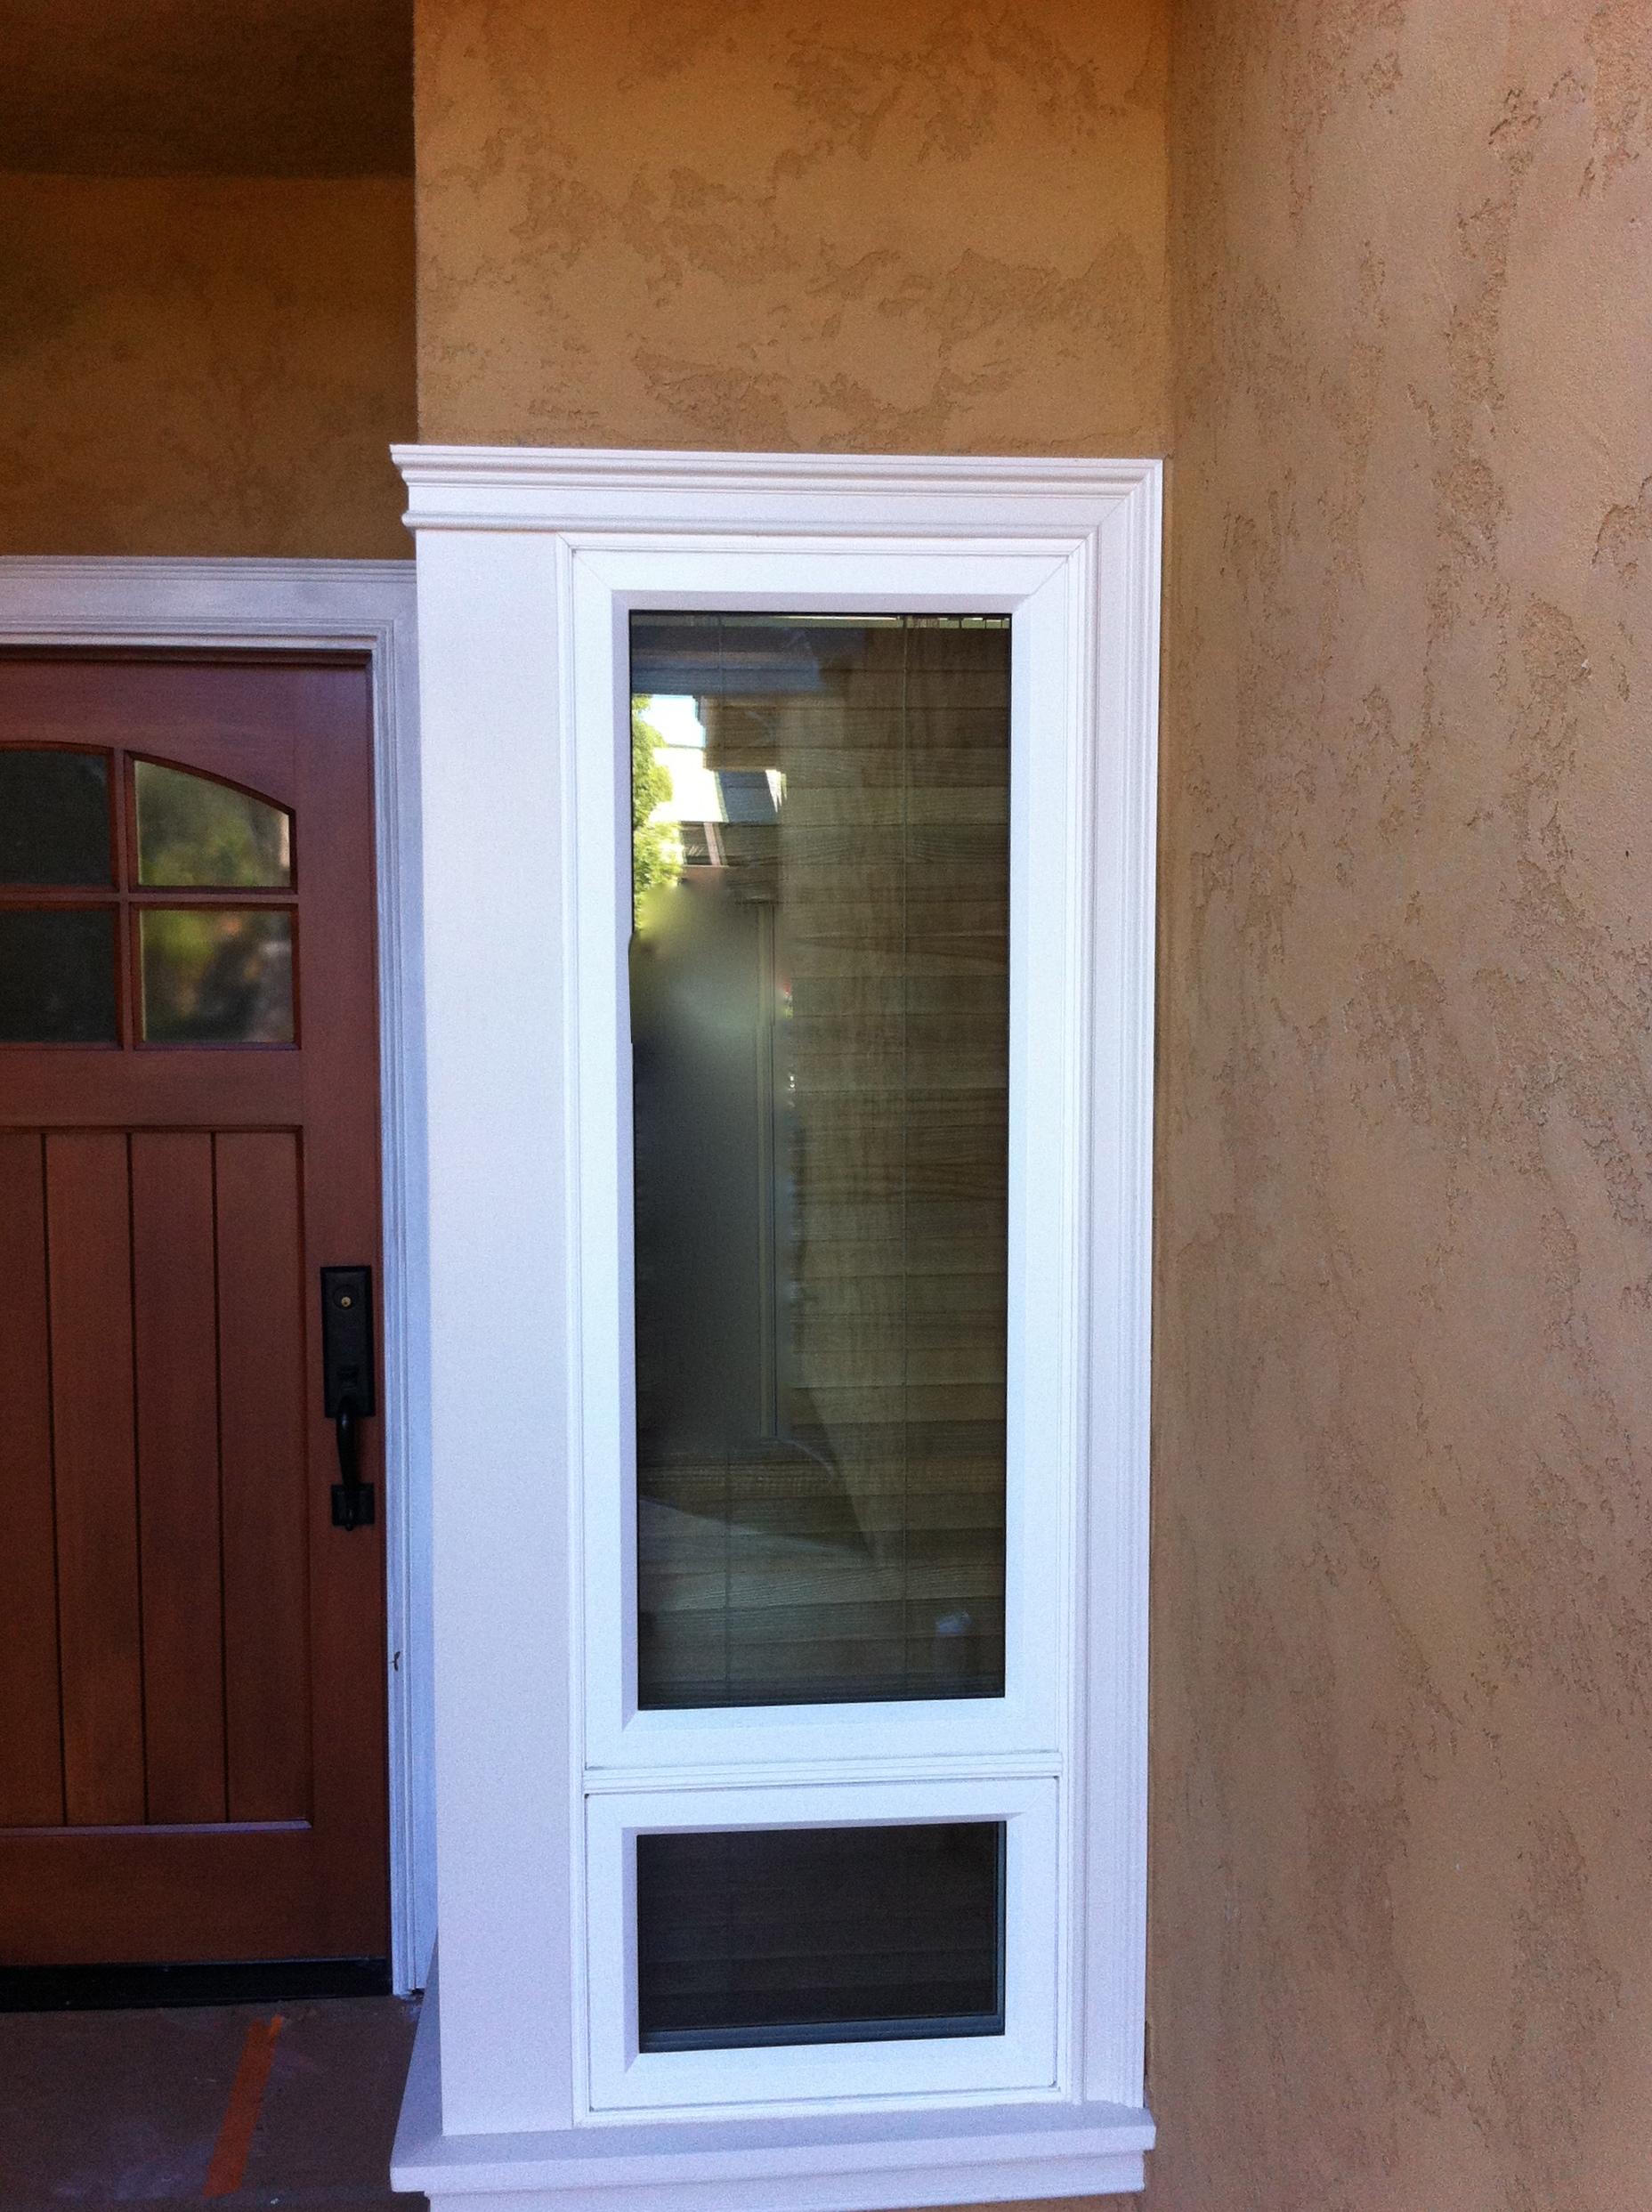 Custom engineered openings windows and doors chula vista for Custom windows and doors